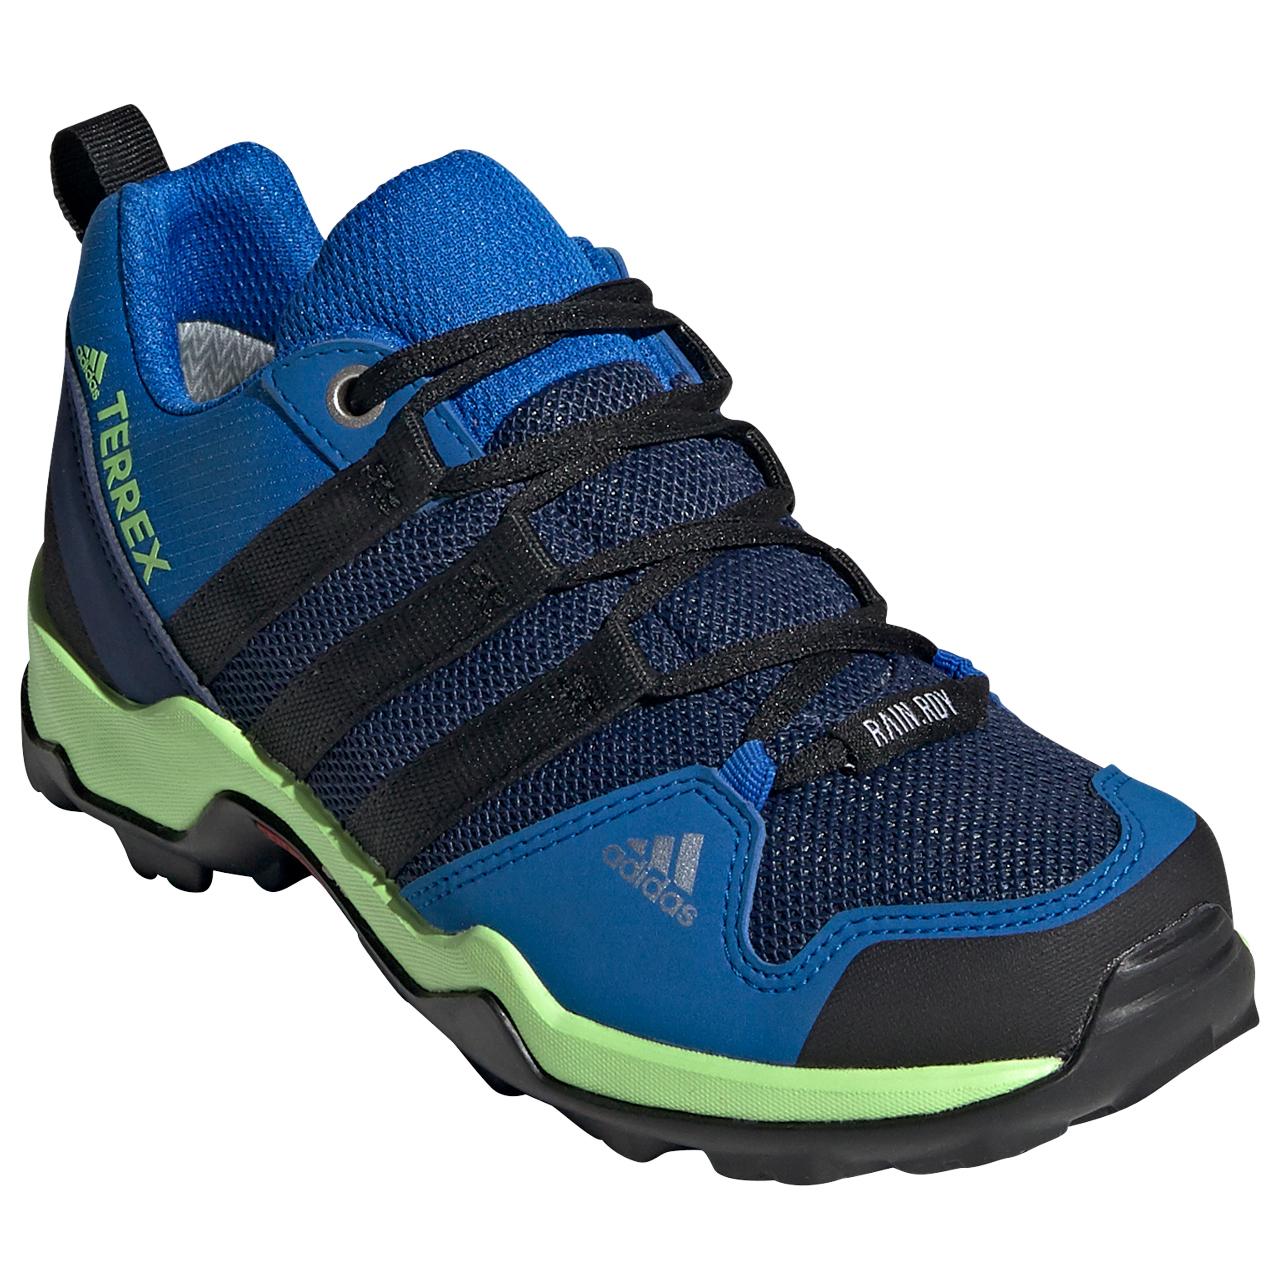 derrota Galleta colonia  Adidas Terrex AX2R CP - Multisport shoes Kids   Buy online   Bergfreunde.eu